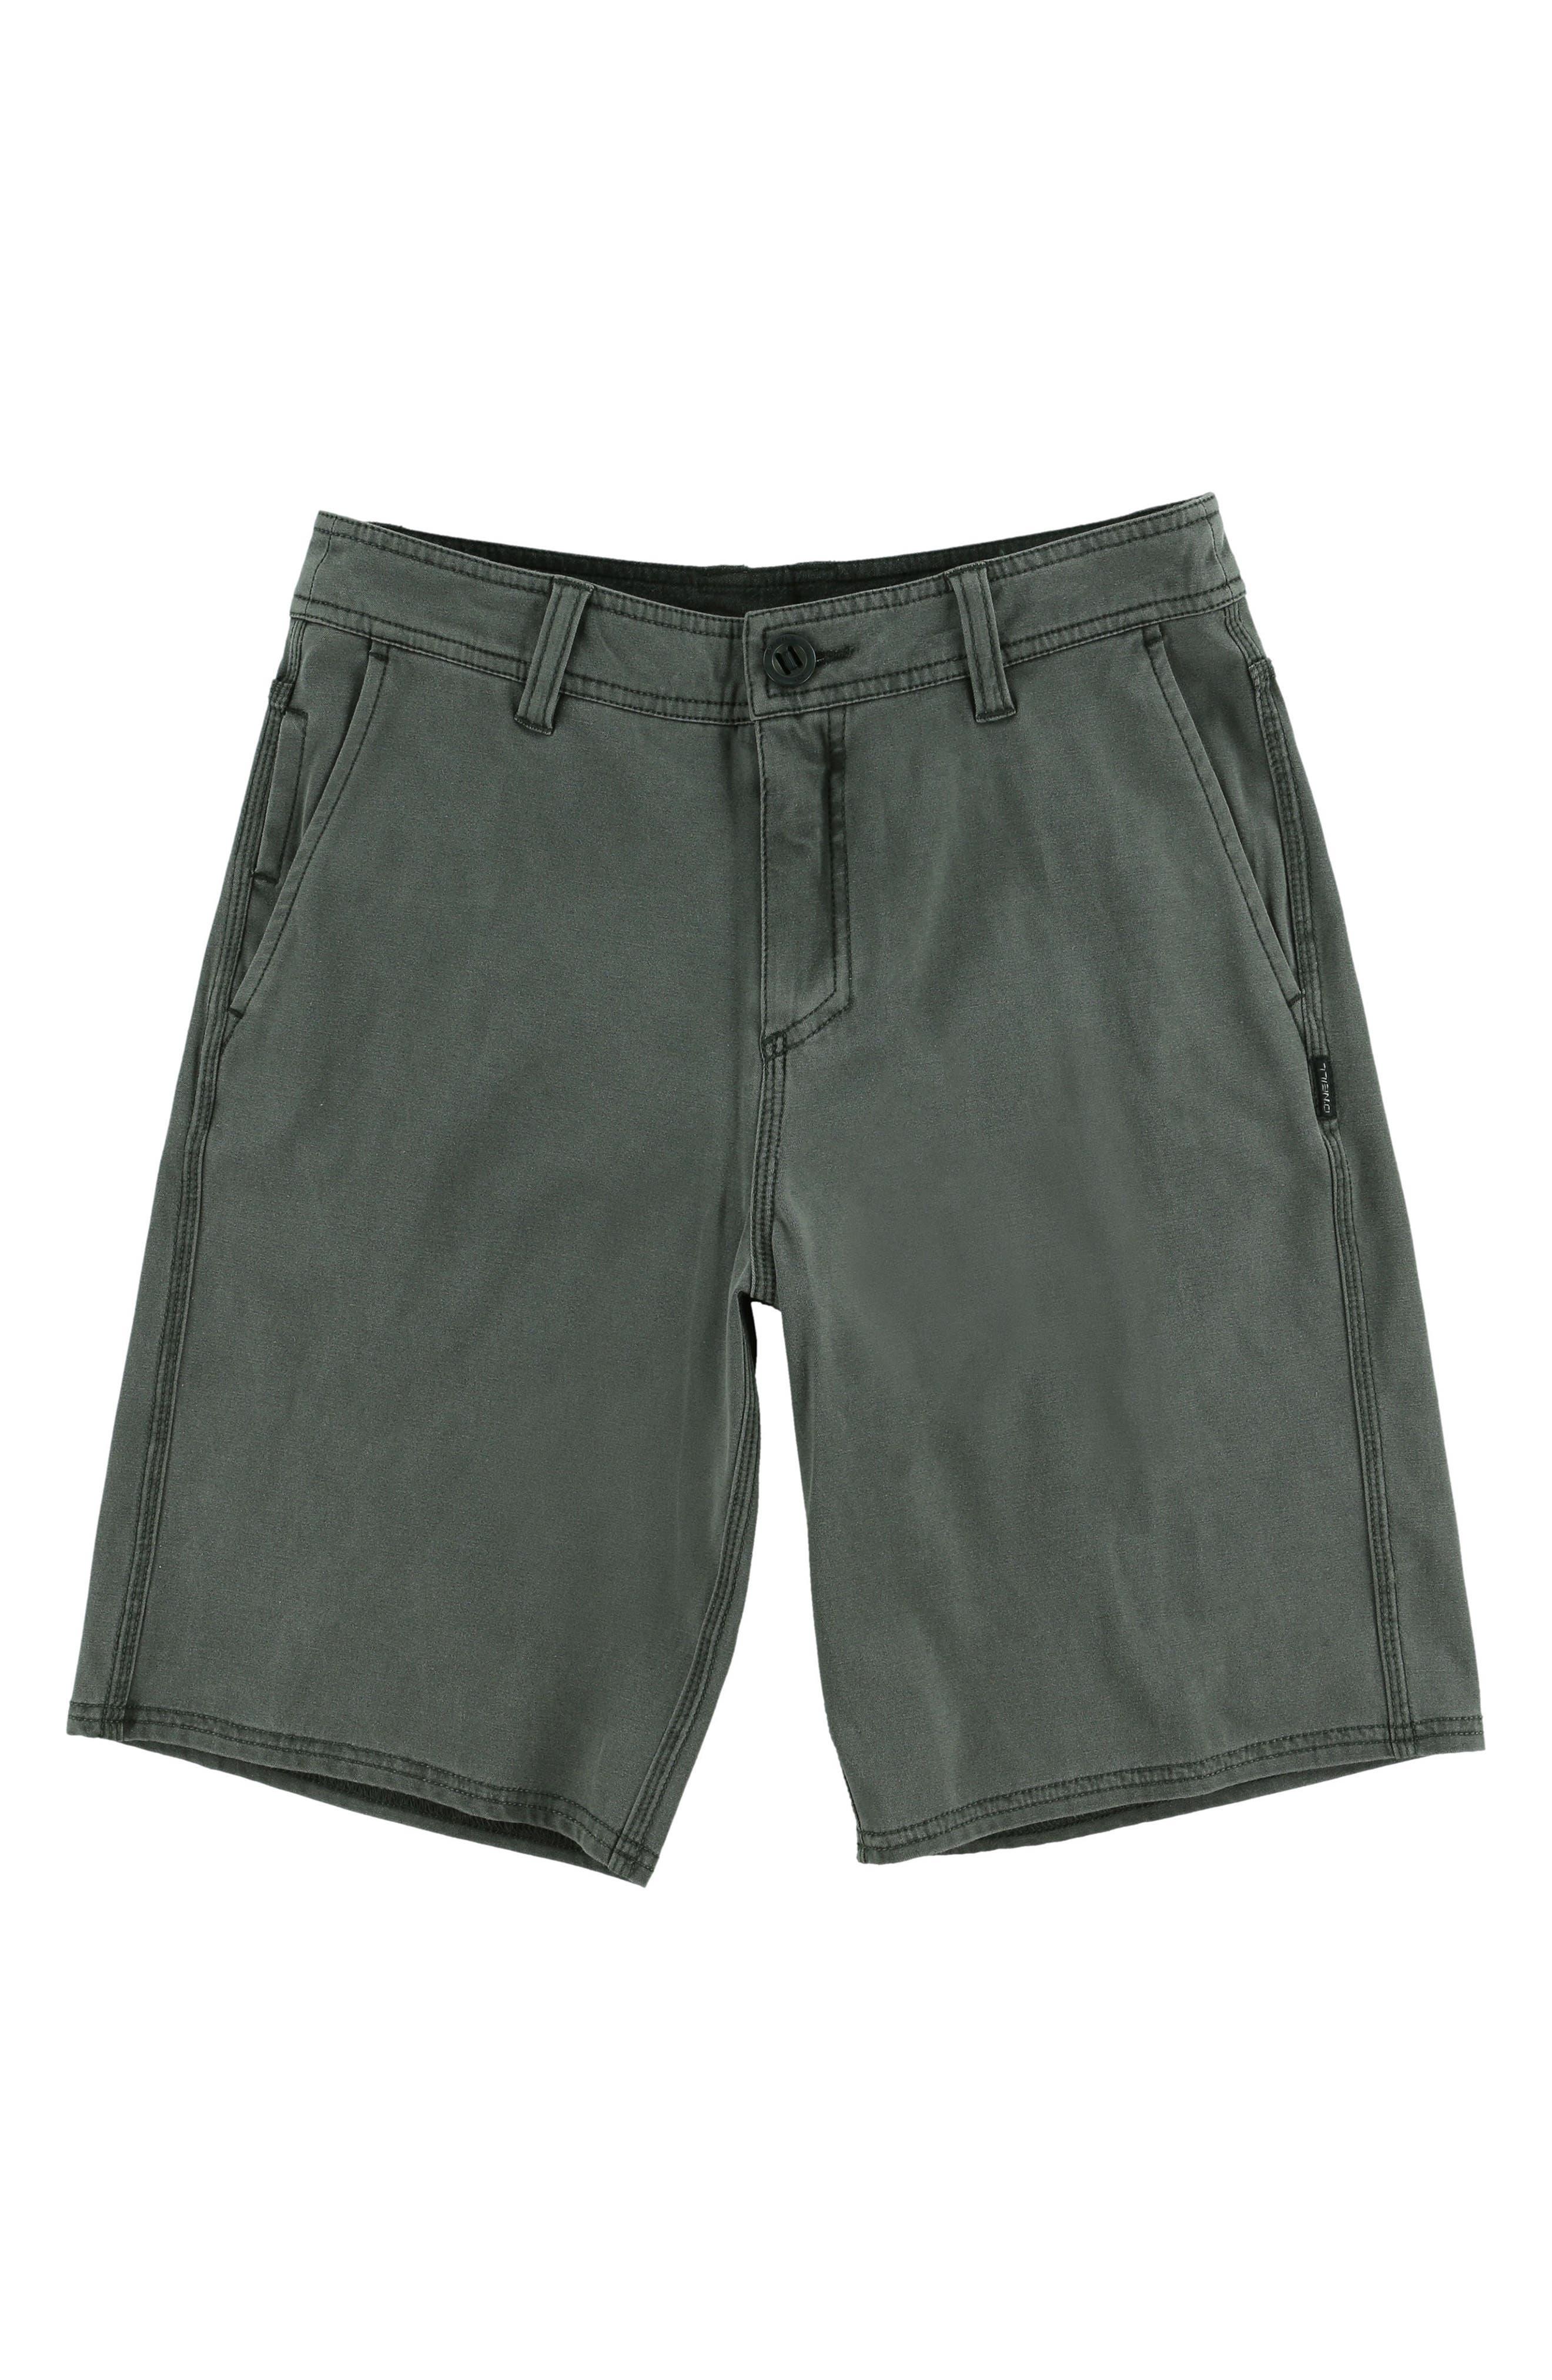 O'Neill Venture Overdye Shorts (Big Boys)